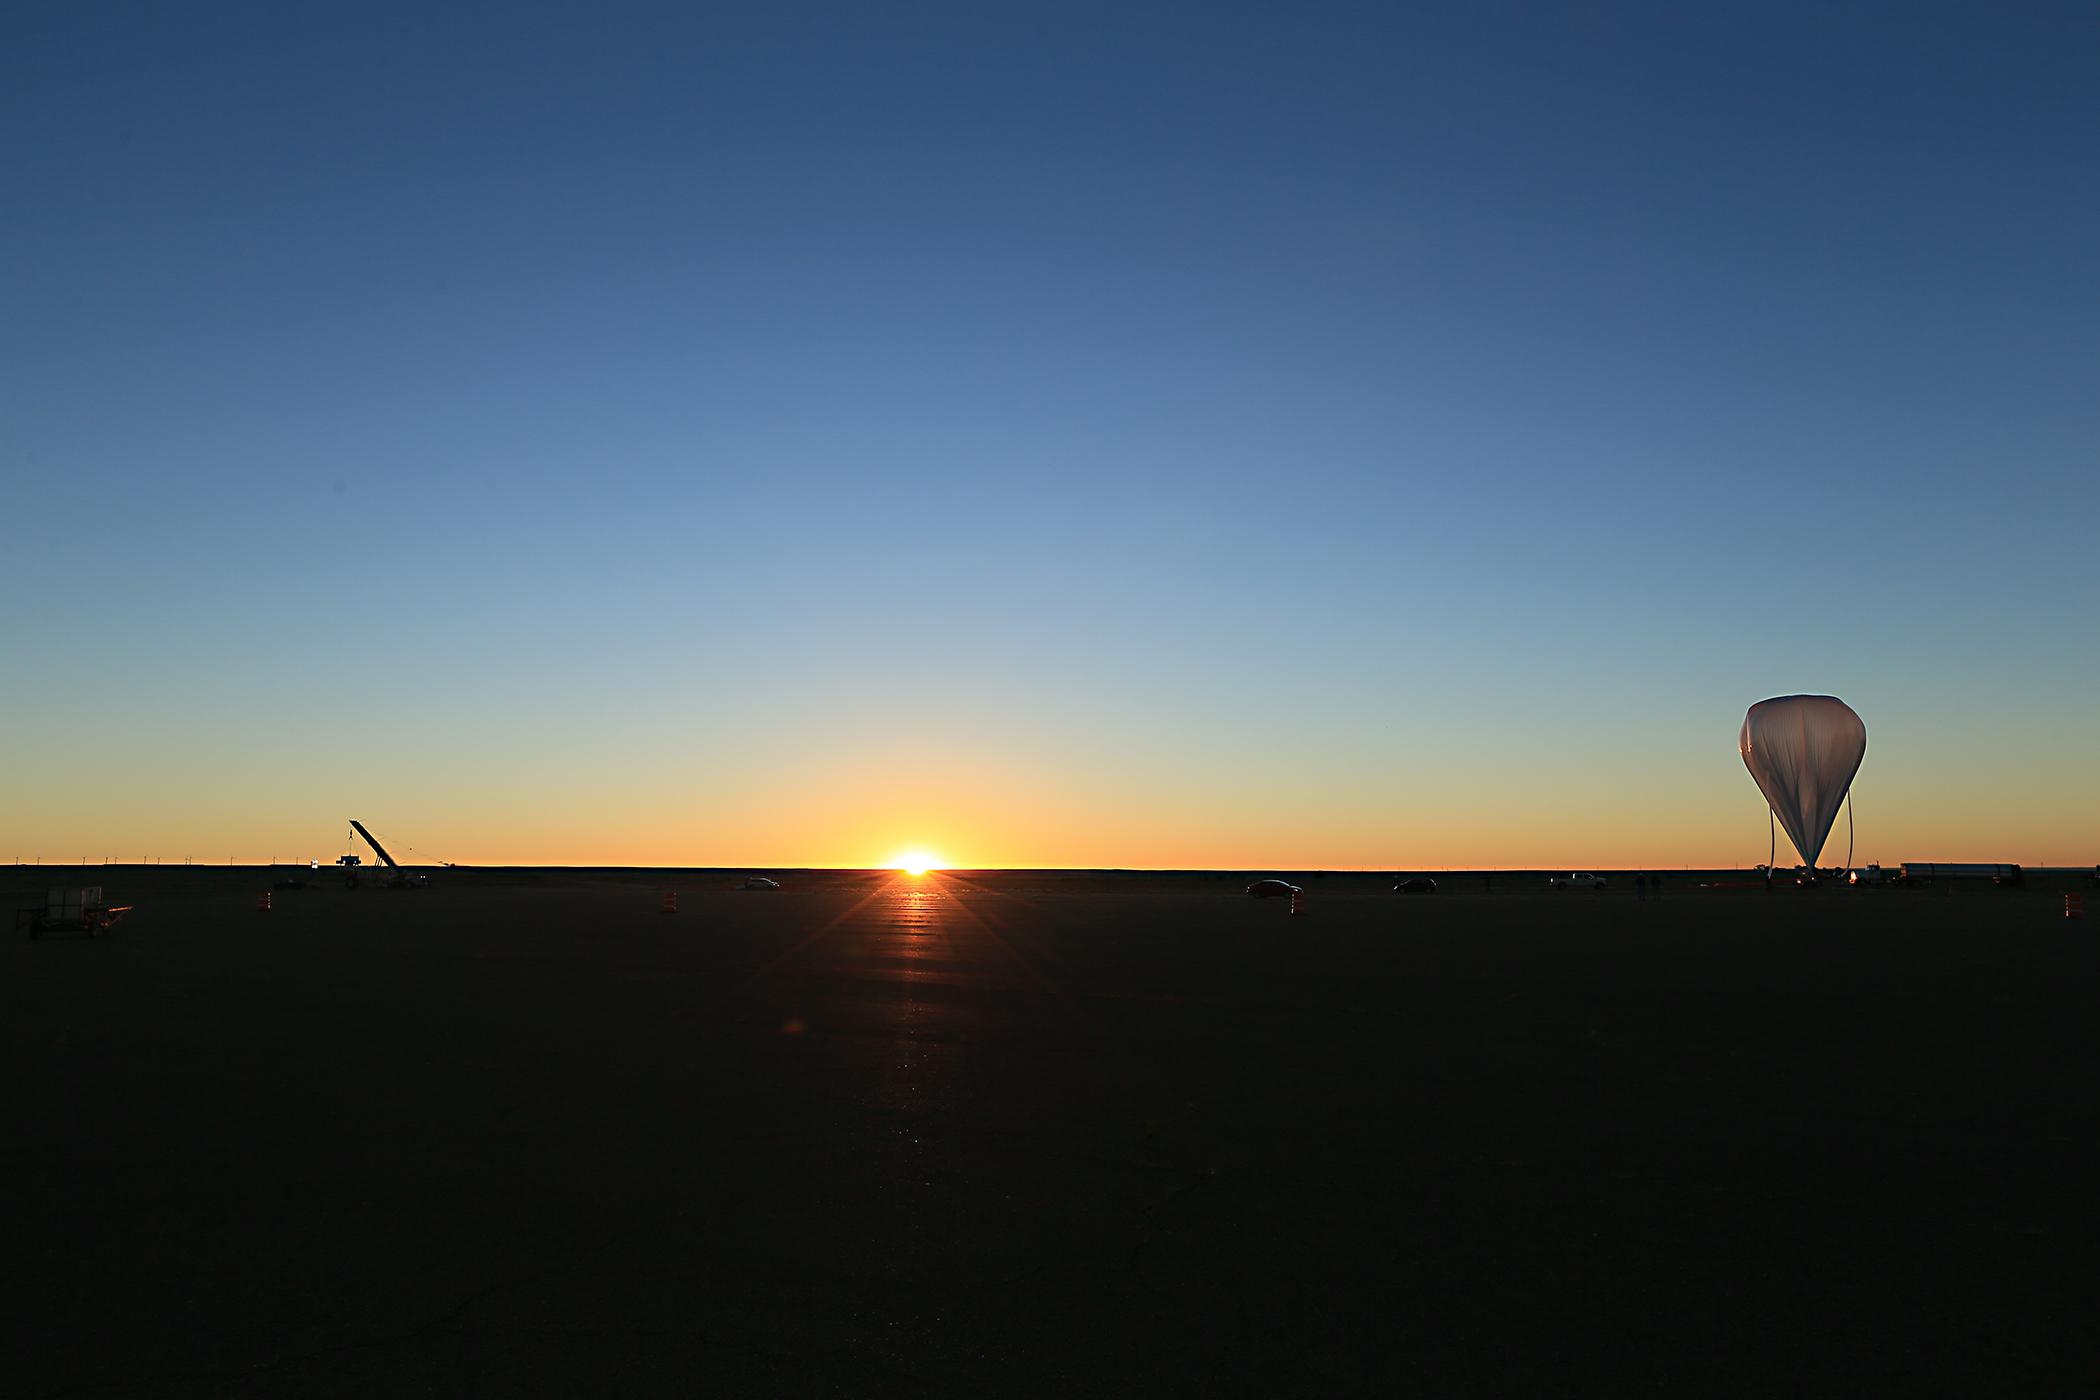 NASA Seeking Student Science Experiments for Balloon ...